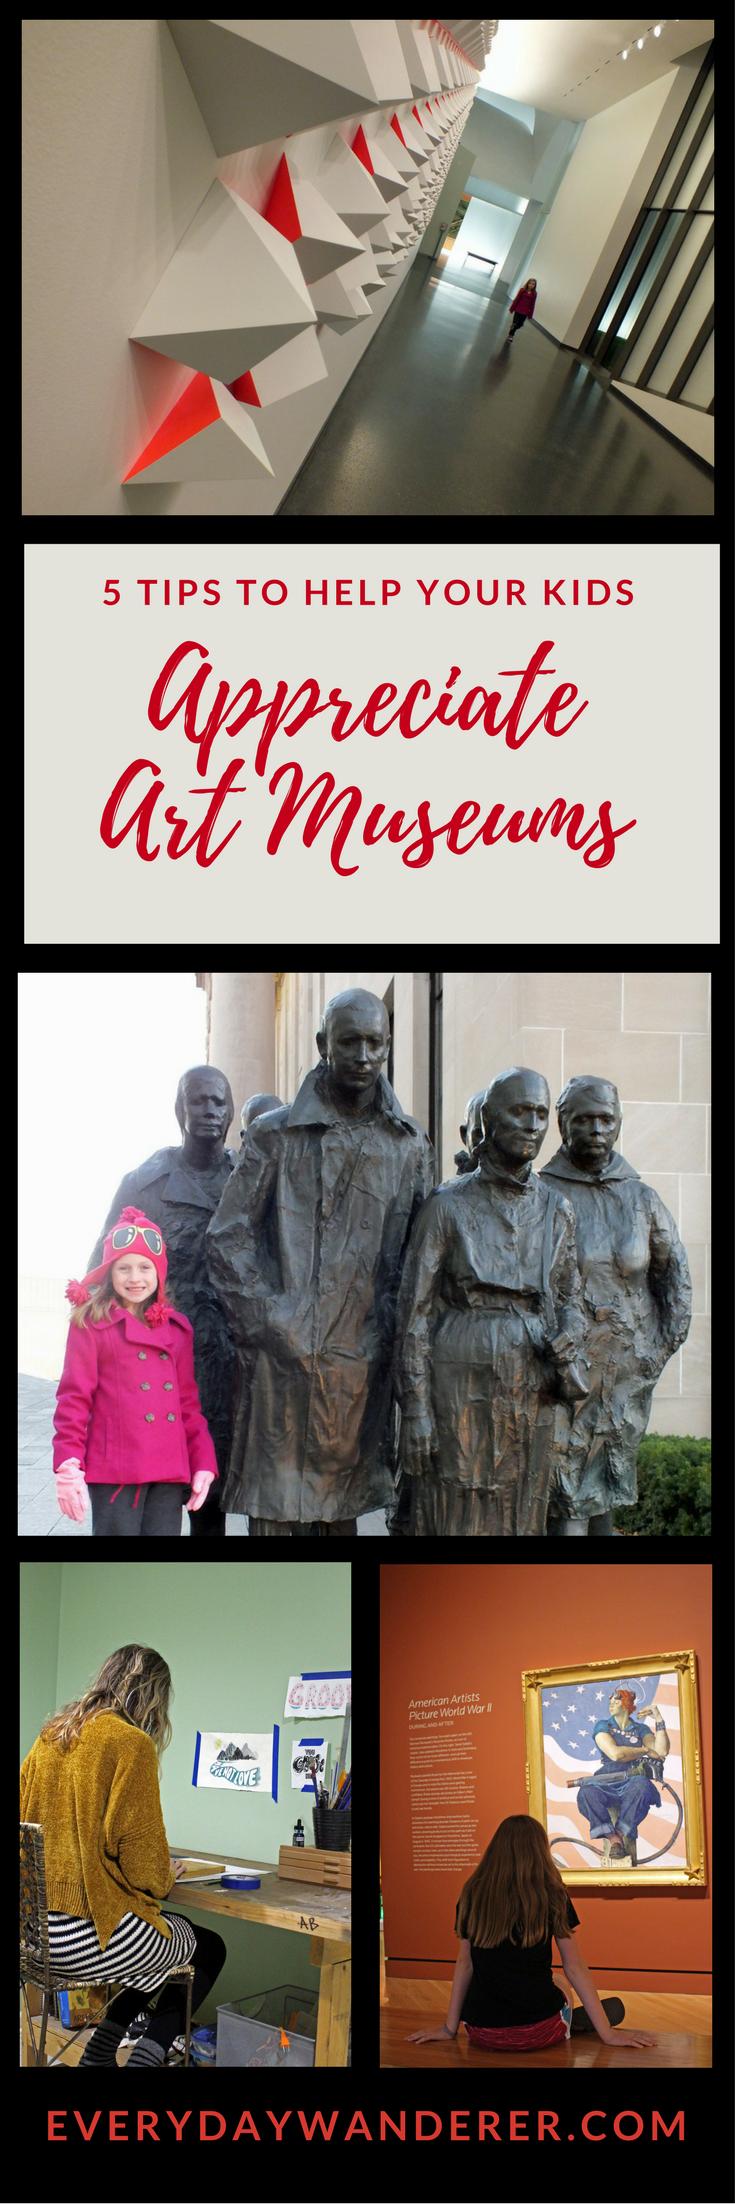 5 tips to help your kids appreciate art museums by everydaywanderer.com #art #museum #artmuseum #travel #kids